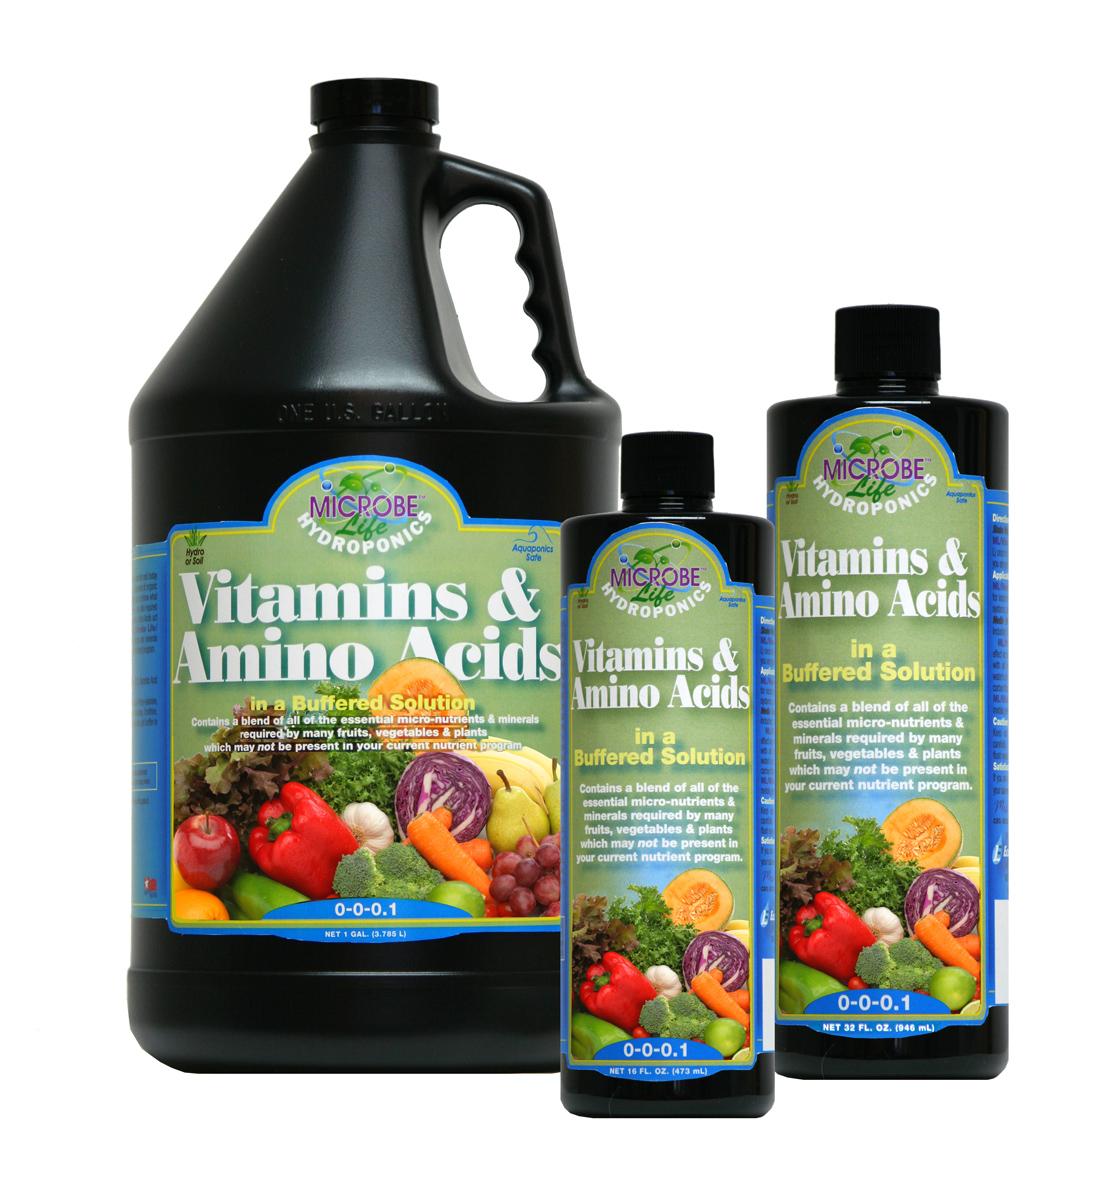 Vitamin & Amino Acids 2.5 Gal